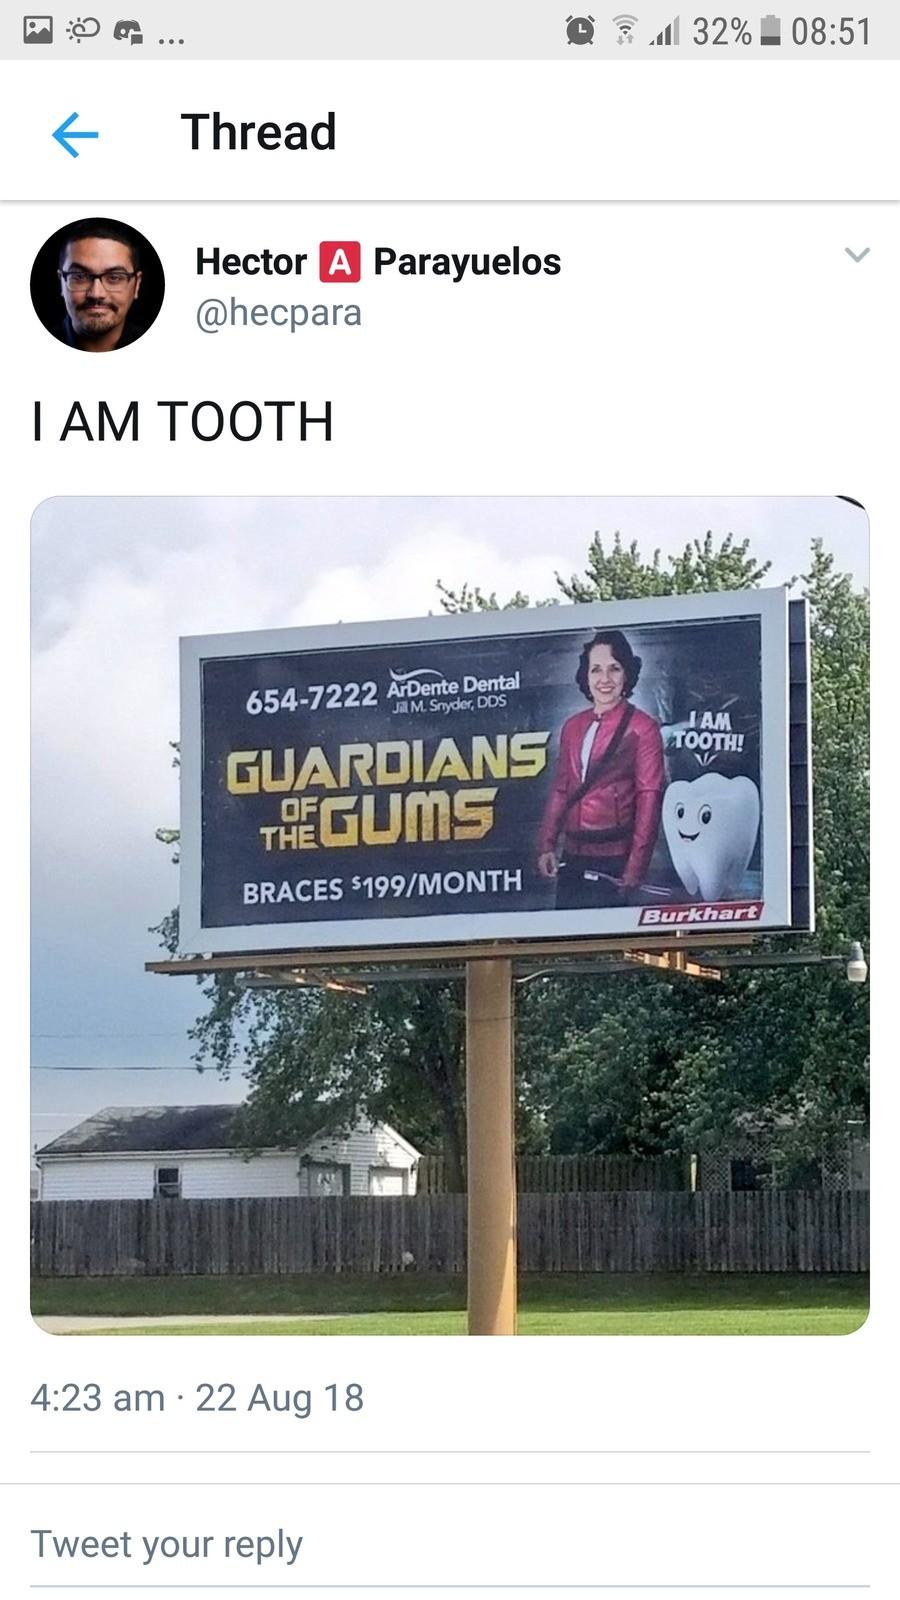 Tooth. .. Dude I've seen that billboard